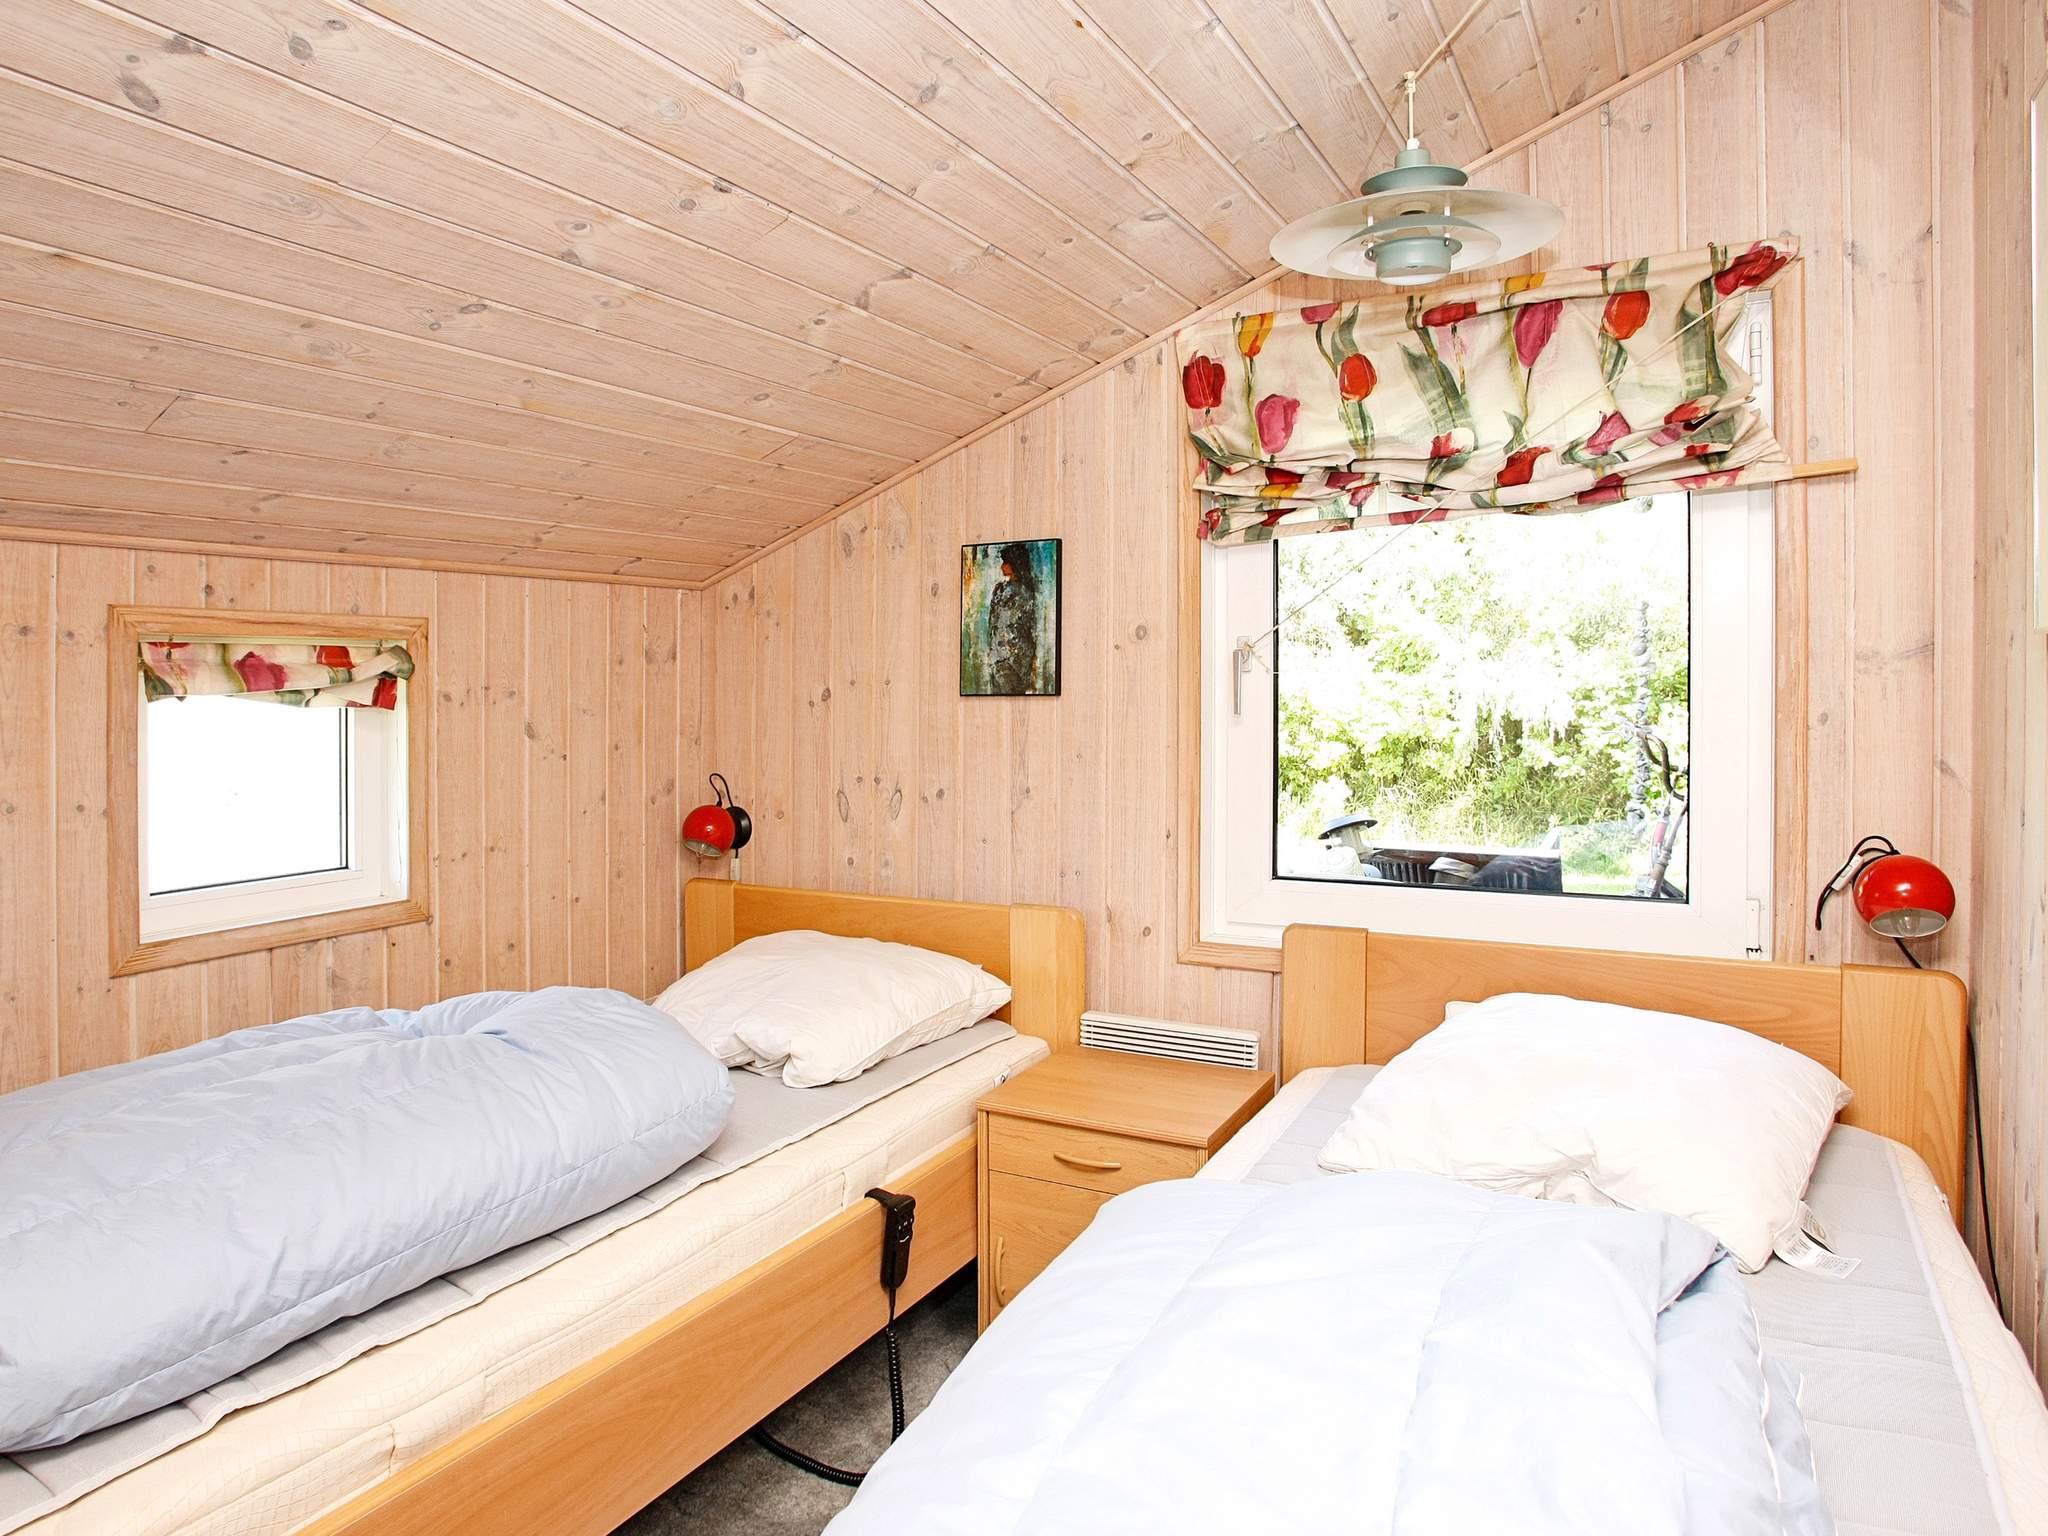 Maison de vacances Helgenæs (86867), Knebel, , Jutland Est, Danemark, image 7